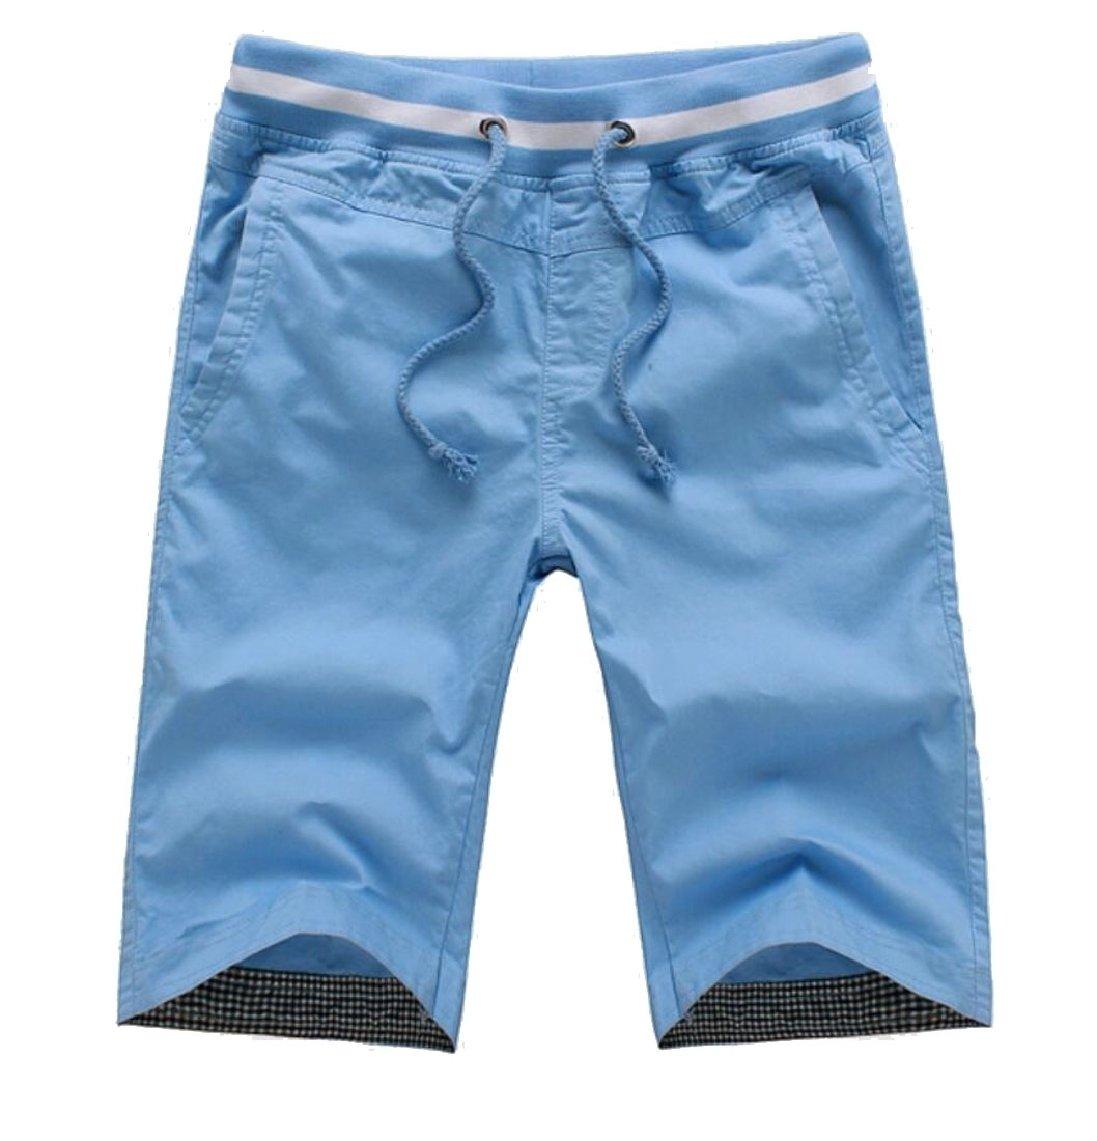 LEISHOP Men Fast Dry Strappy Shorts Slant Pockets Beach Wear Boxers